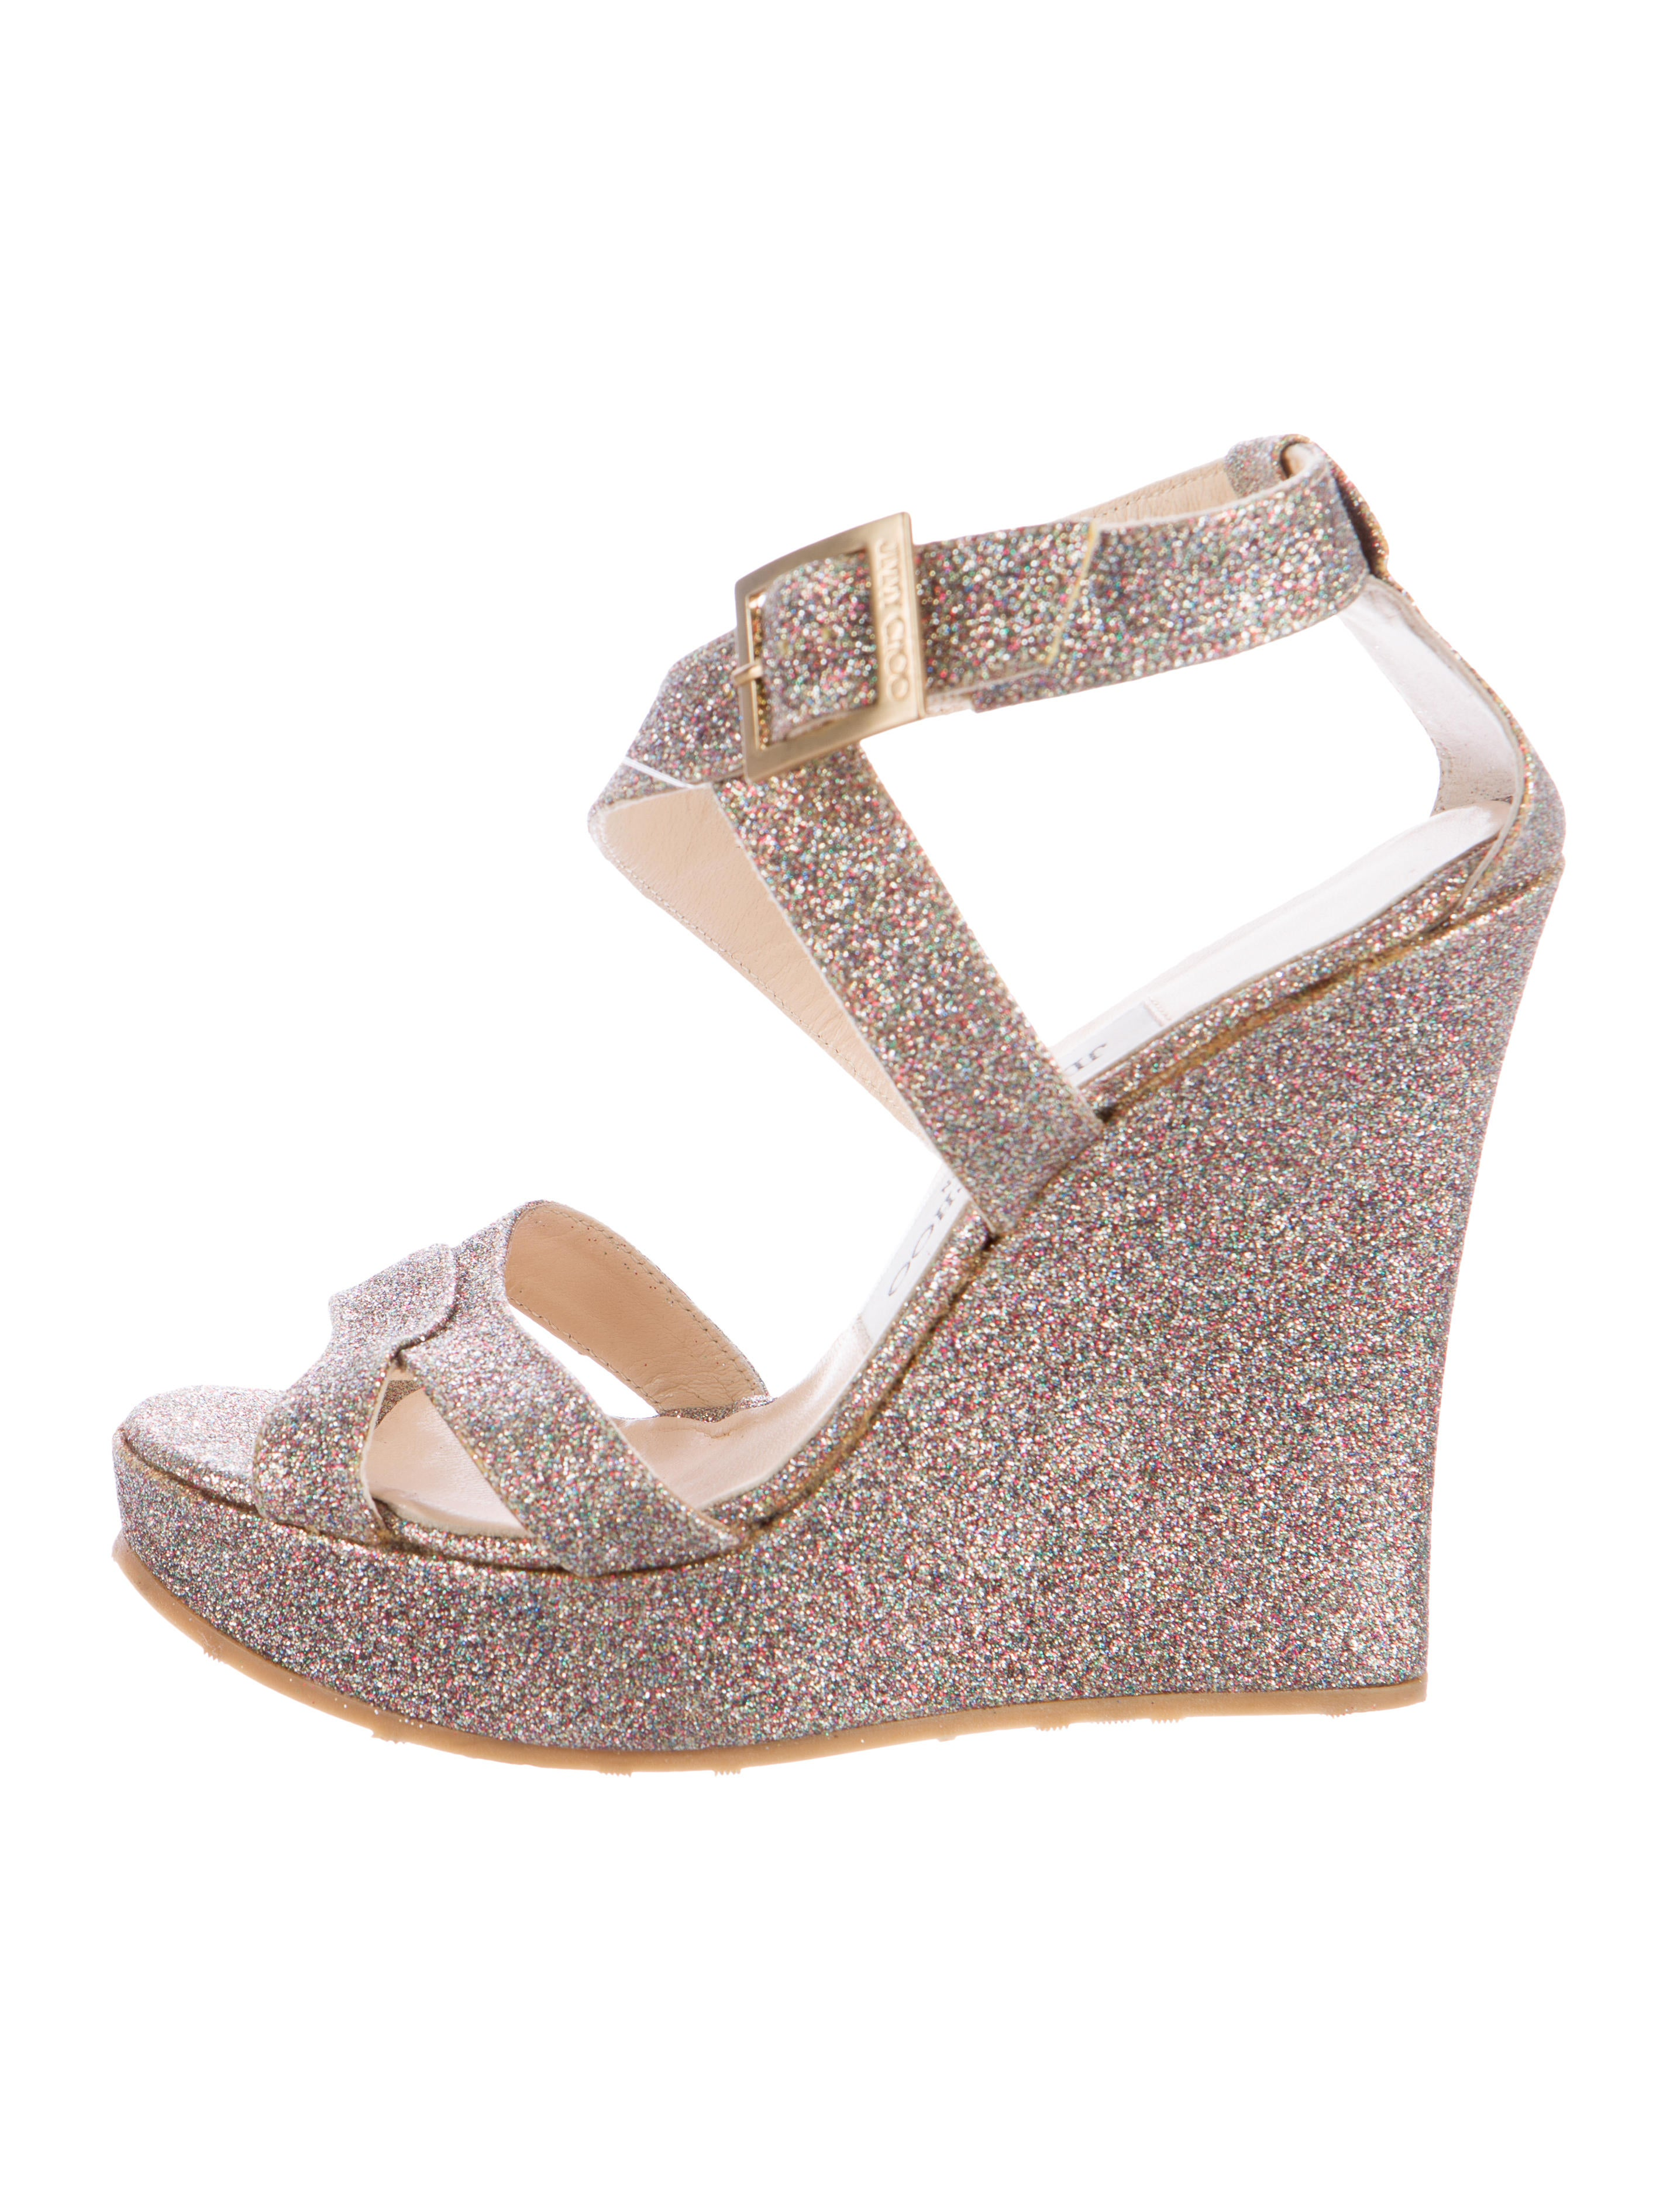 67eca09565b Jimmy Choo Penny Glitter Wedge Sandals - Shoes - JIM53263